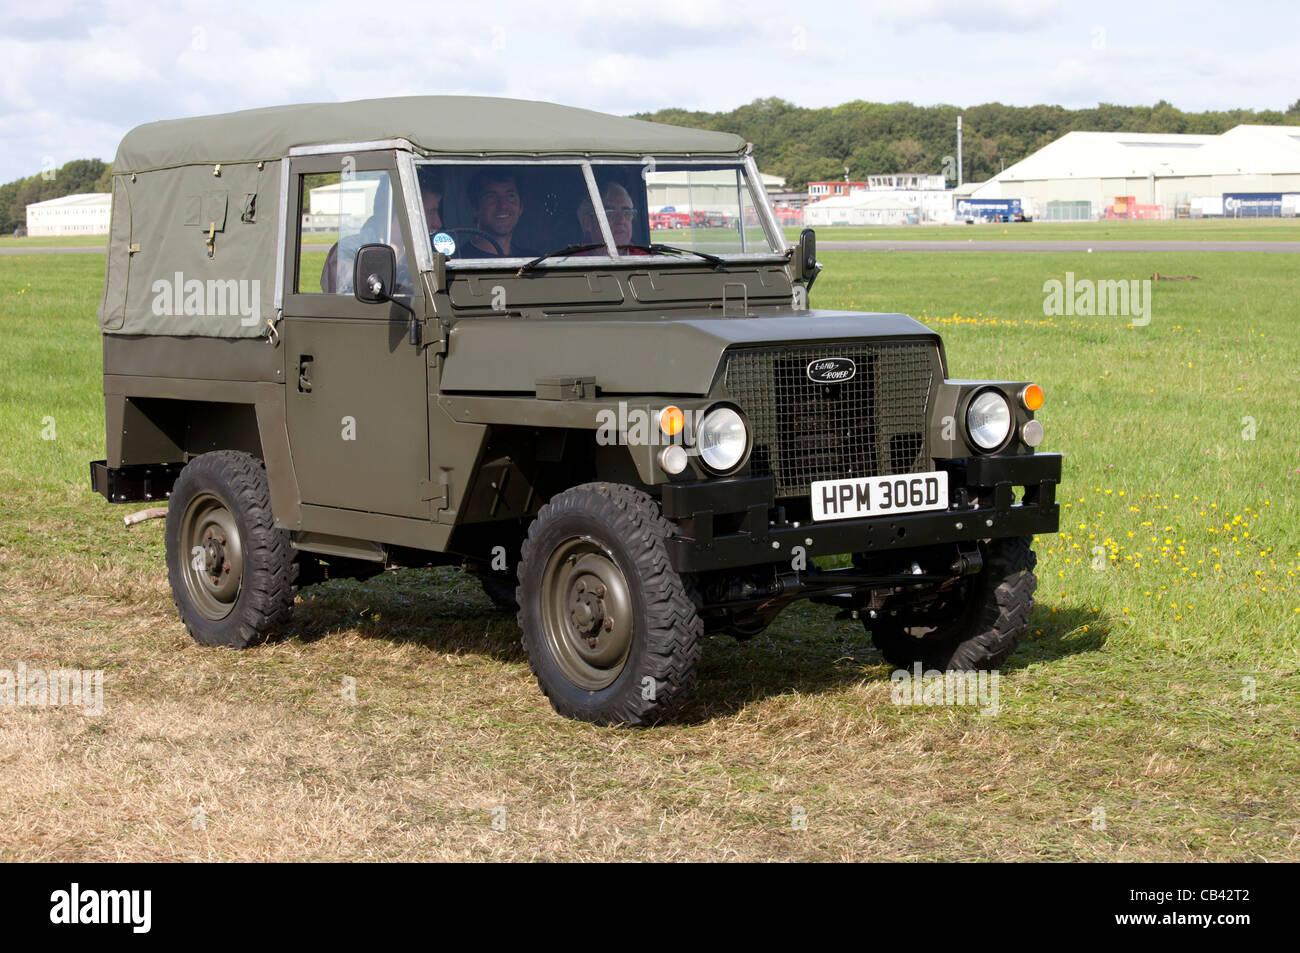 Military Land Rover Stock Photos & Military Land Rover Stock